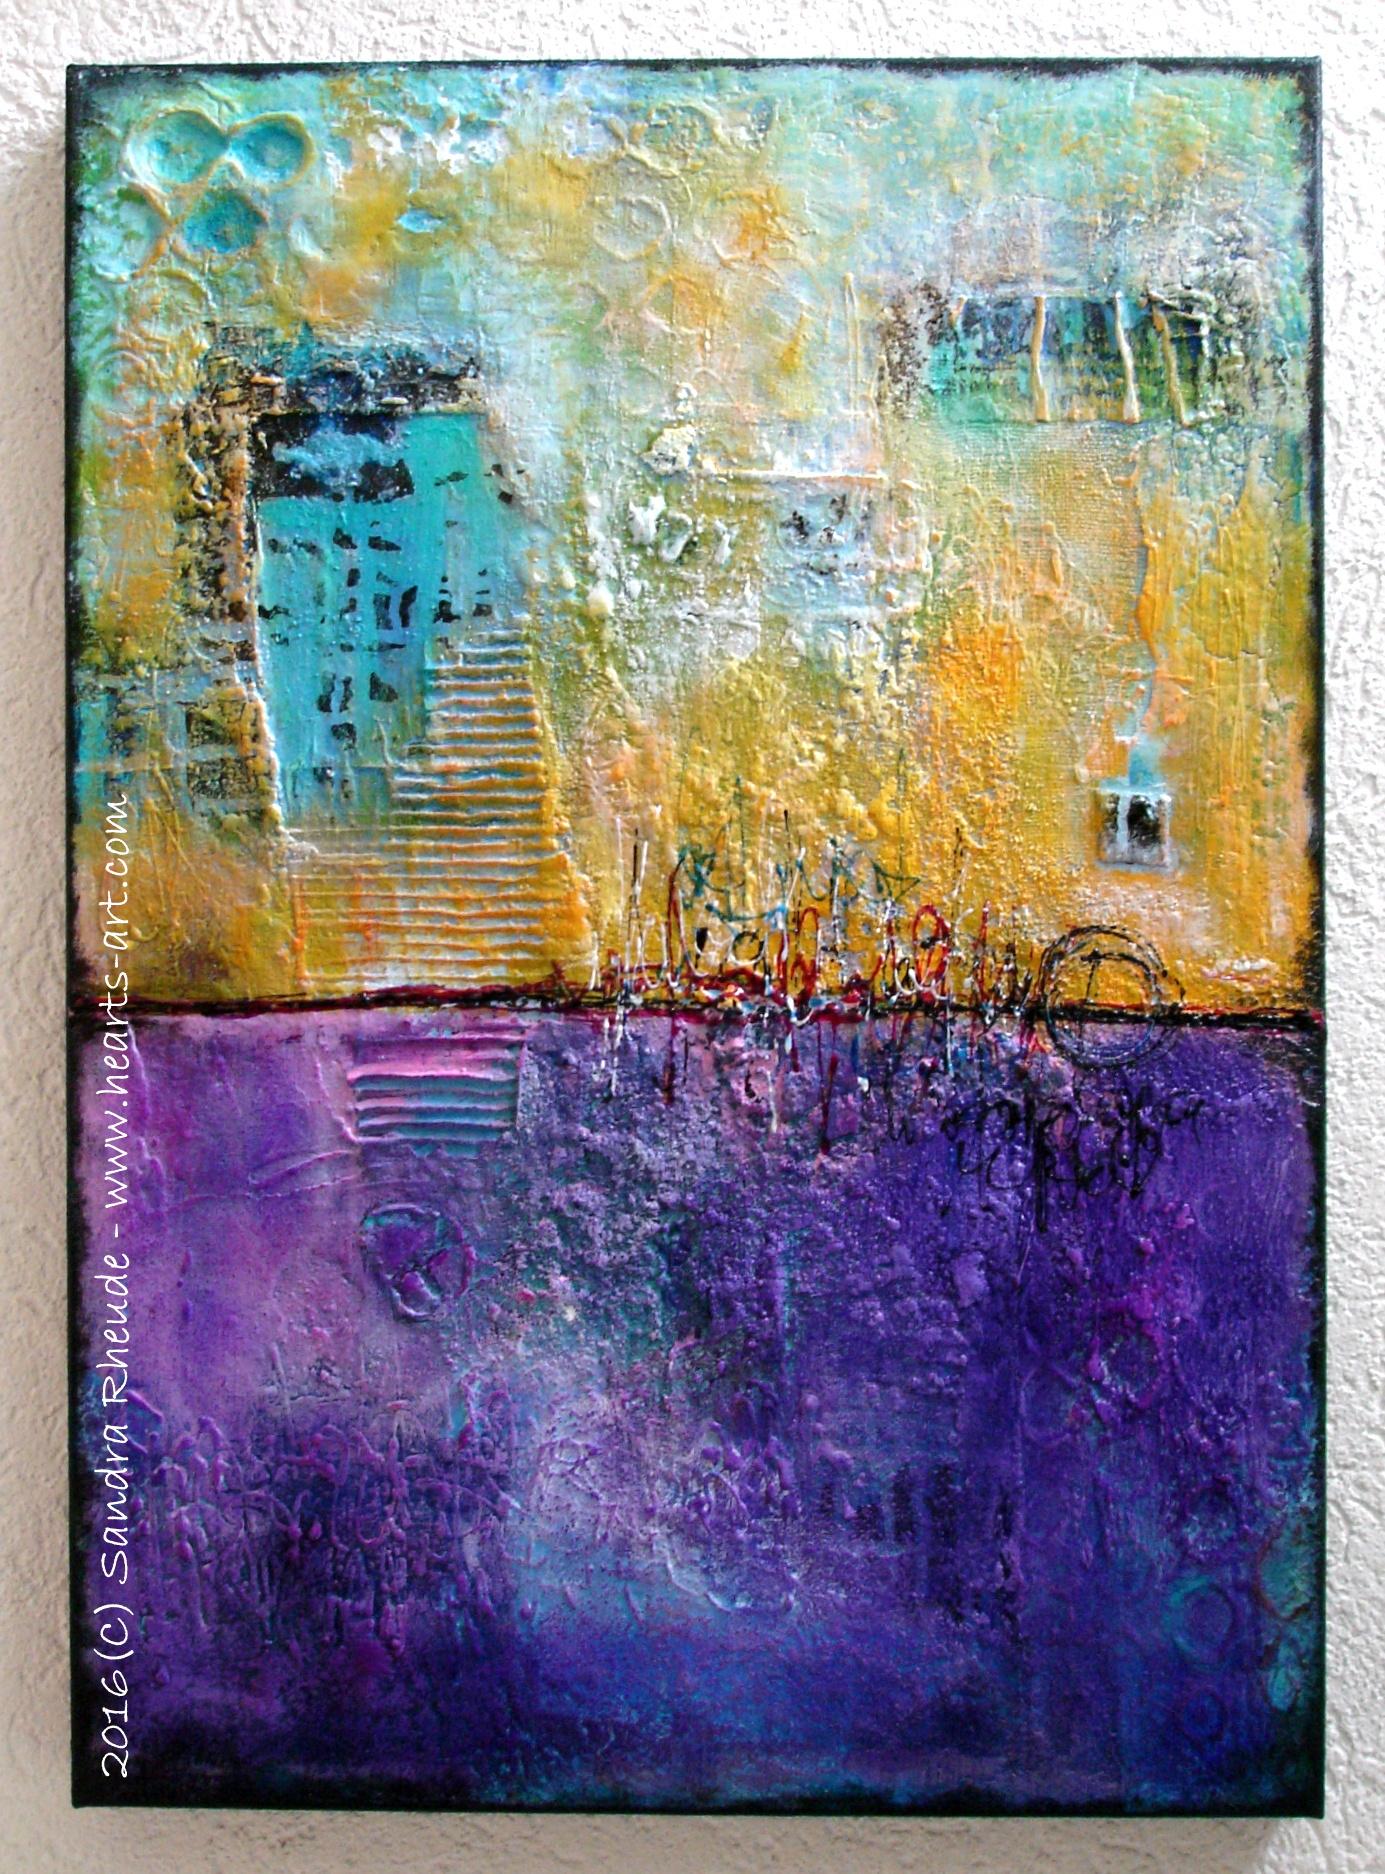 'Granada Day & Night' - 2016/27 - Acryl/MixedMedia auf Leinwand - 50 x 70 x 4,5 cm - € 888